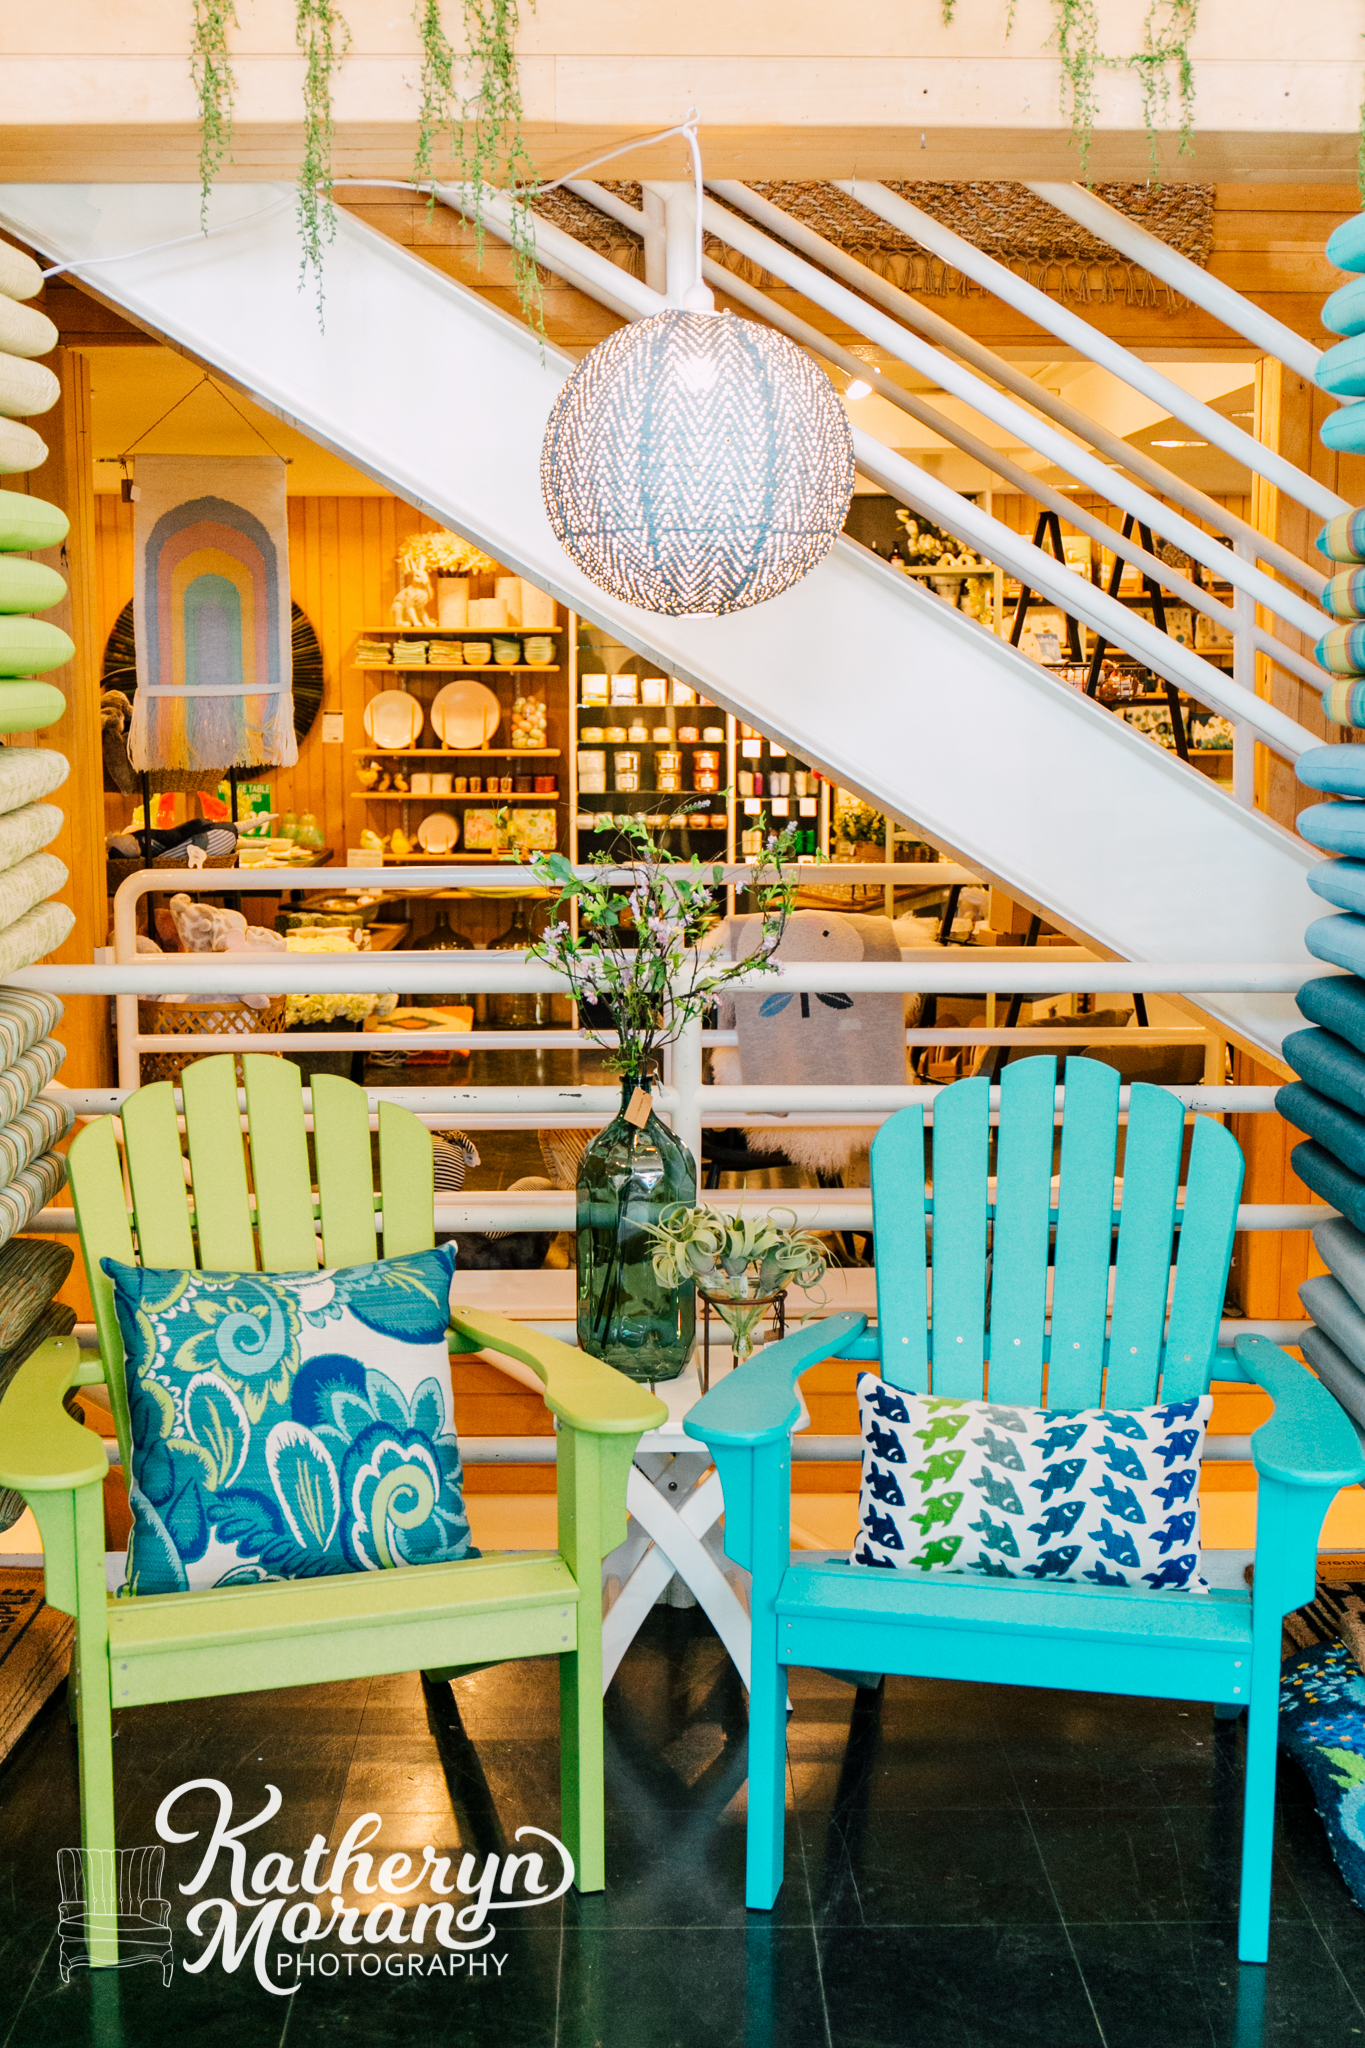 bellingham-marketing-photographer-katheryn-moran-greenhouse-spring-2019-16.jpg